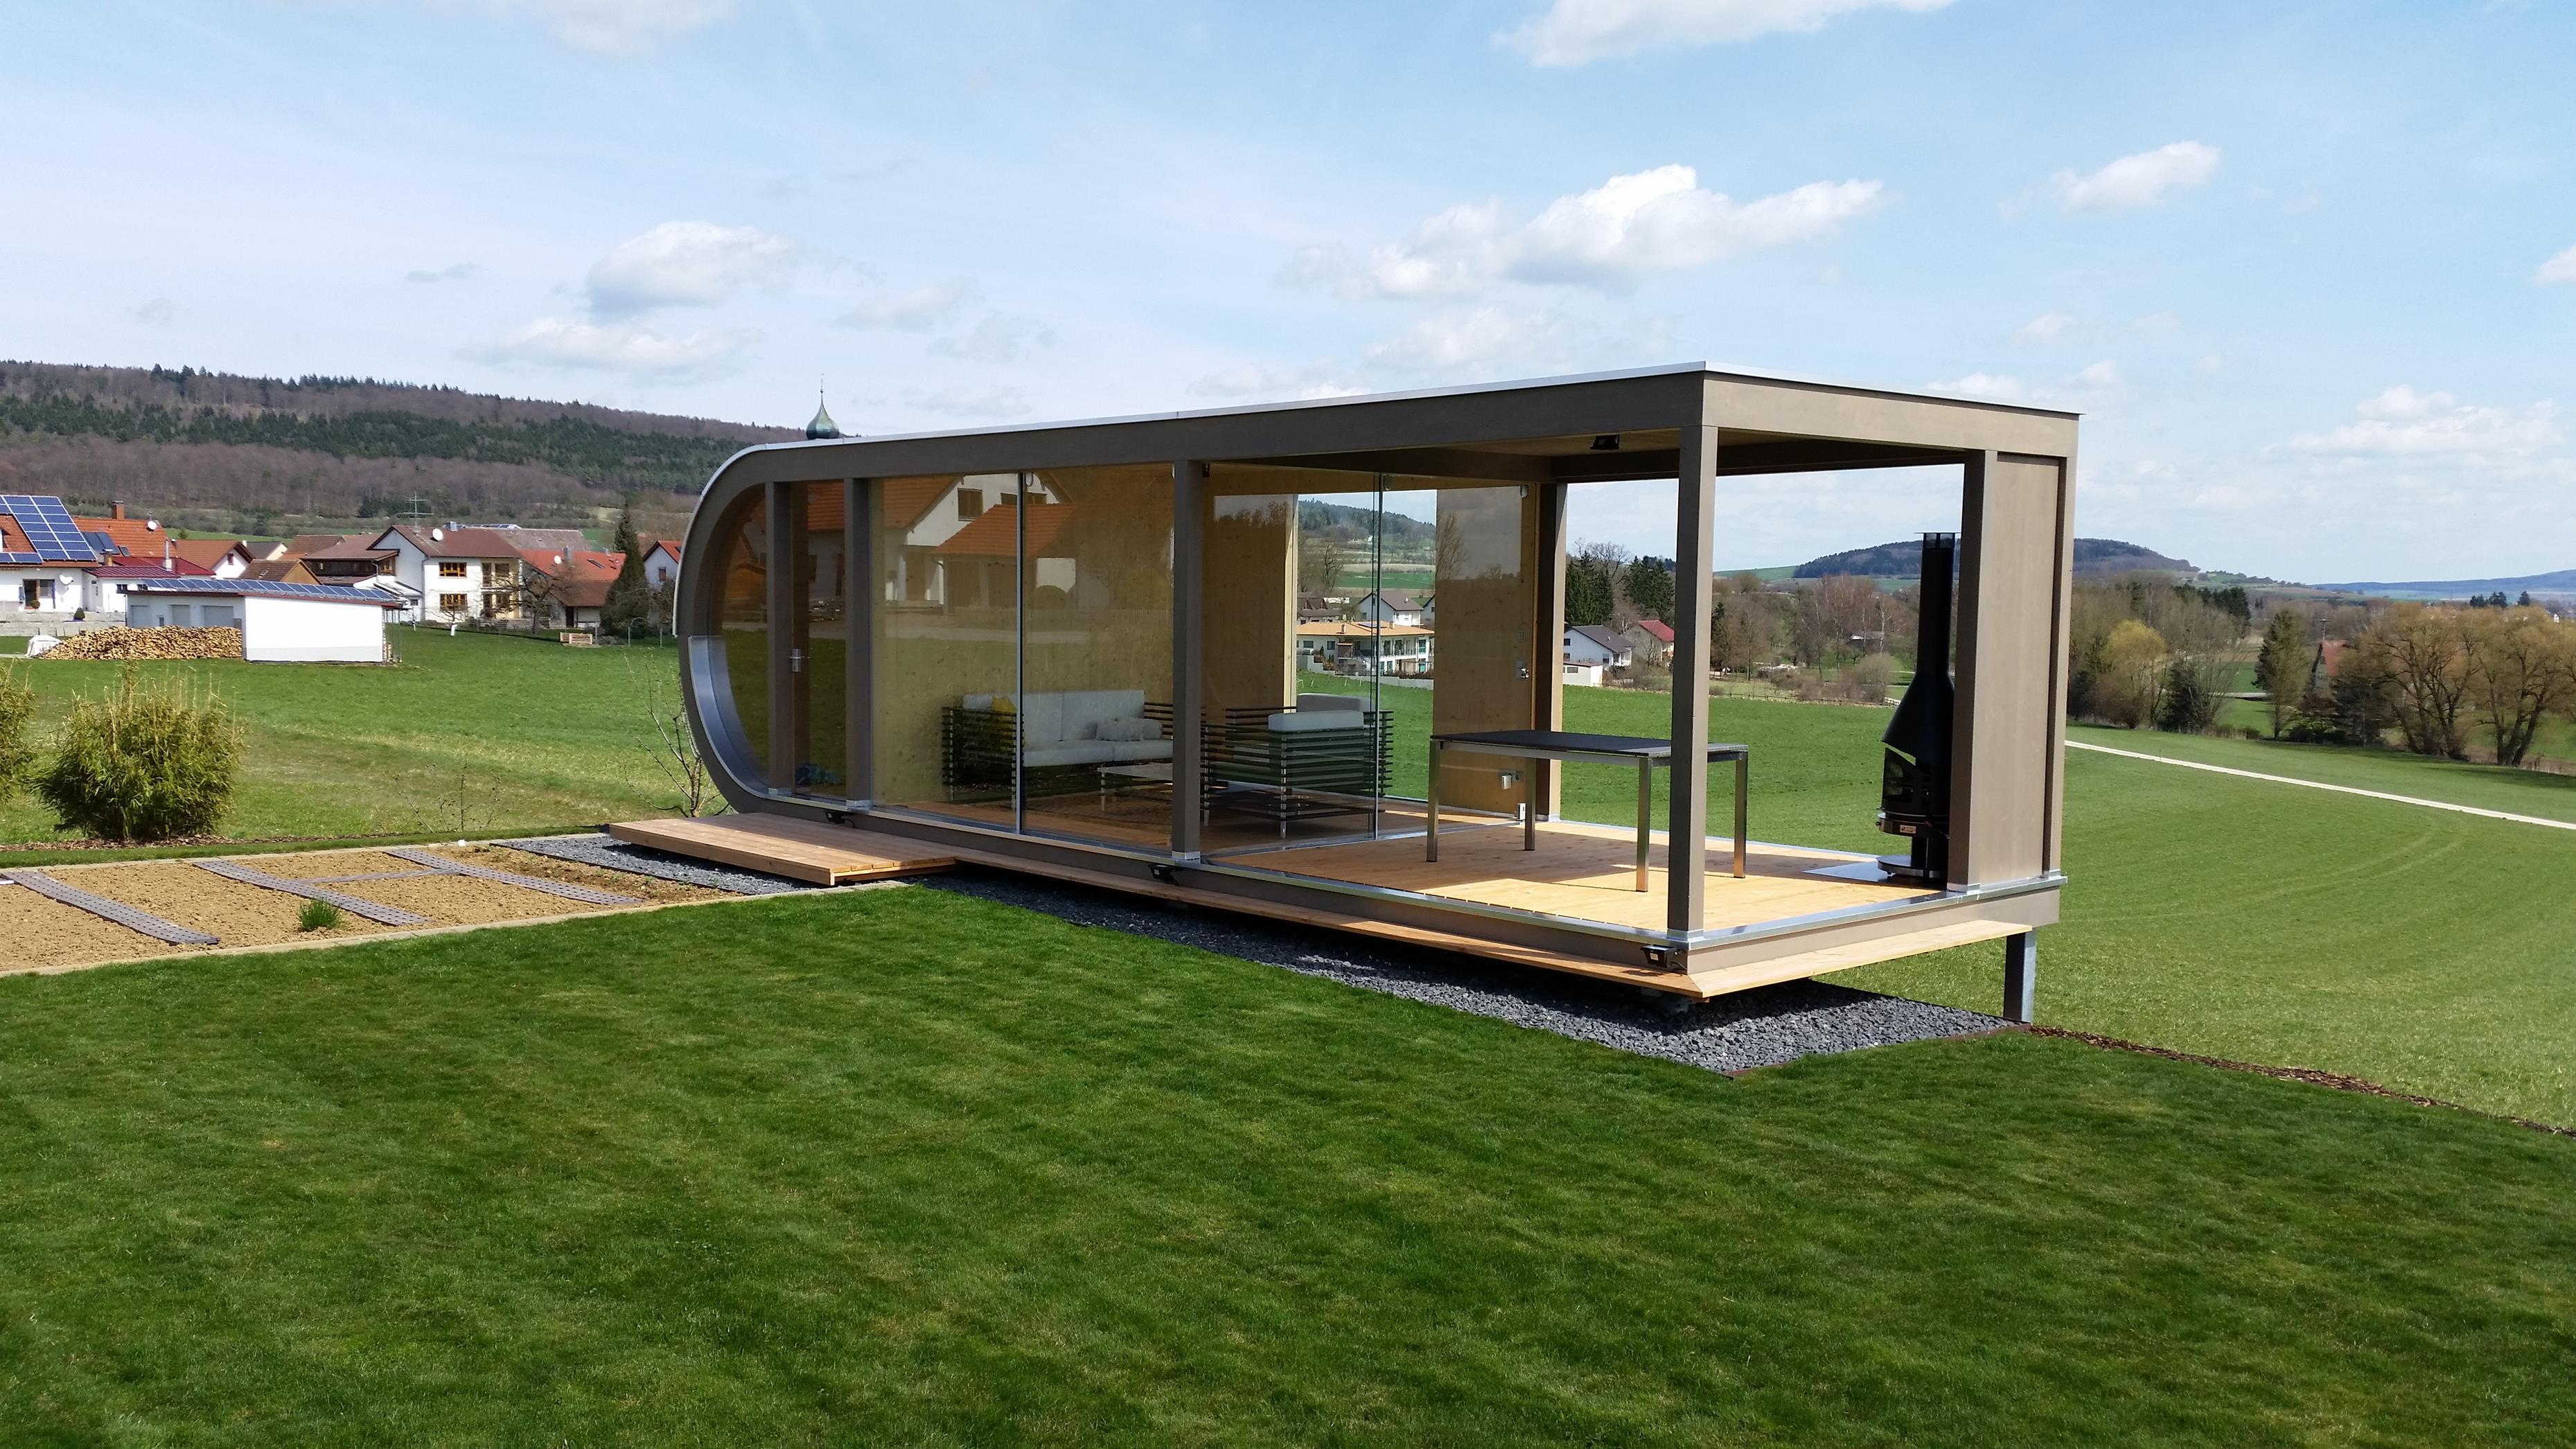 Awesome Gartenhaus Design Flachdach Pictures - Einrichtungs ...